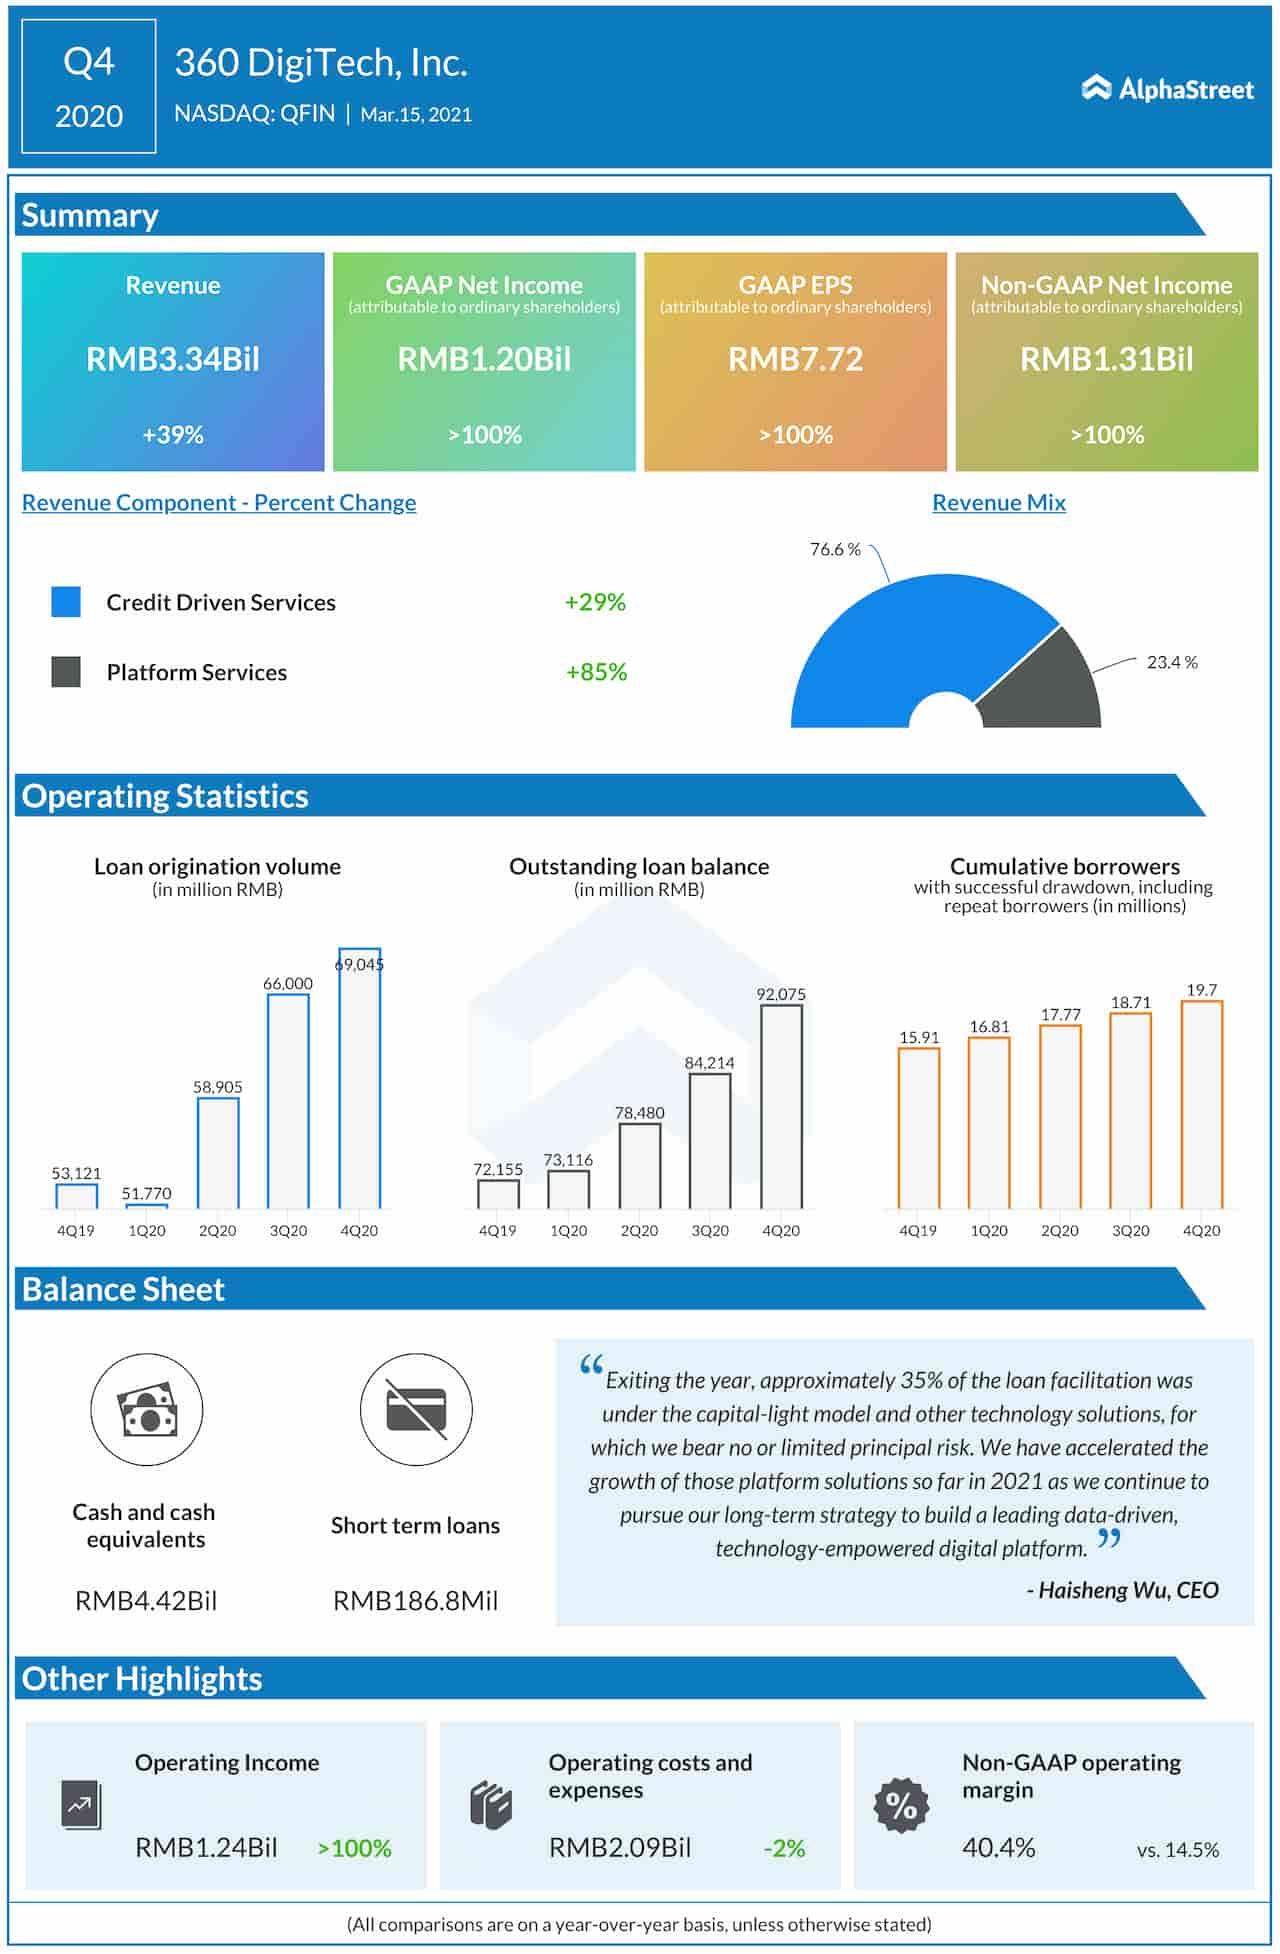 360 DigiTech Q4 2020 earnings infographic